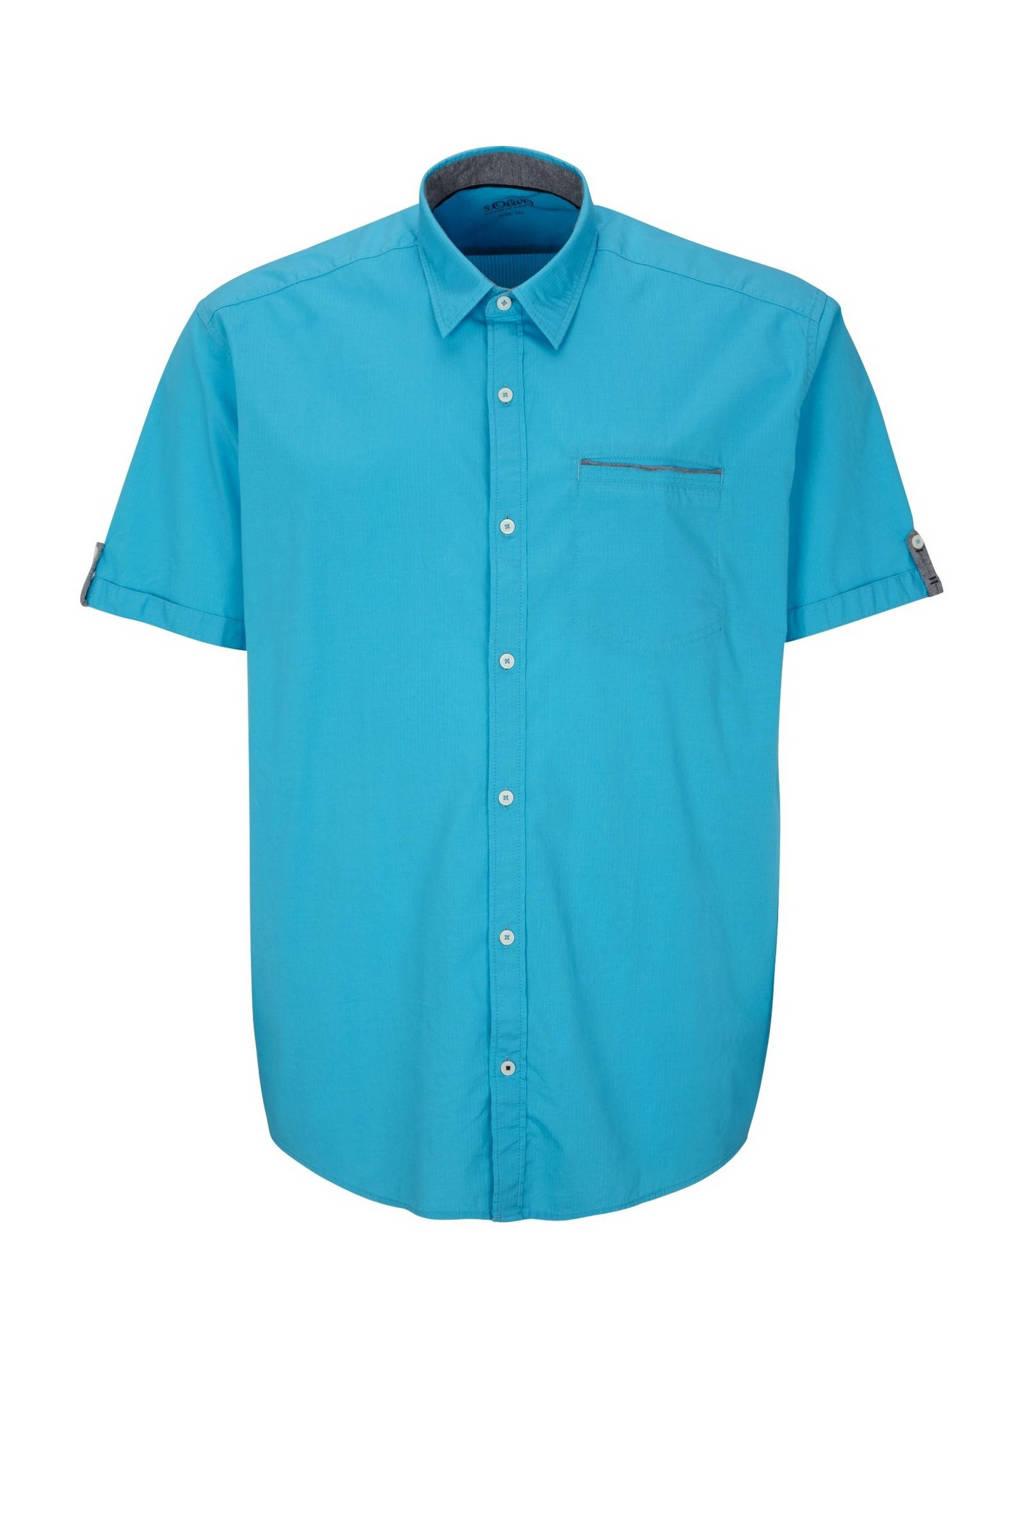 s.Oliver regular fit denim overhemd turquoise, Turquoise